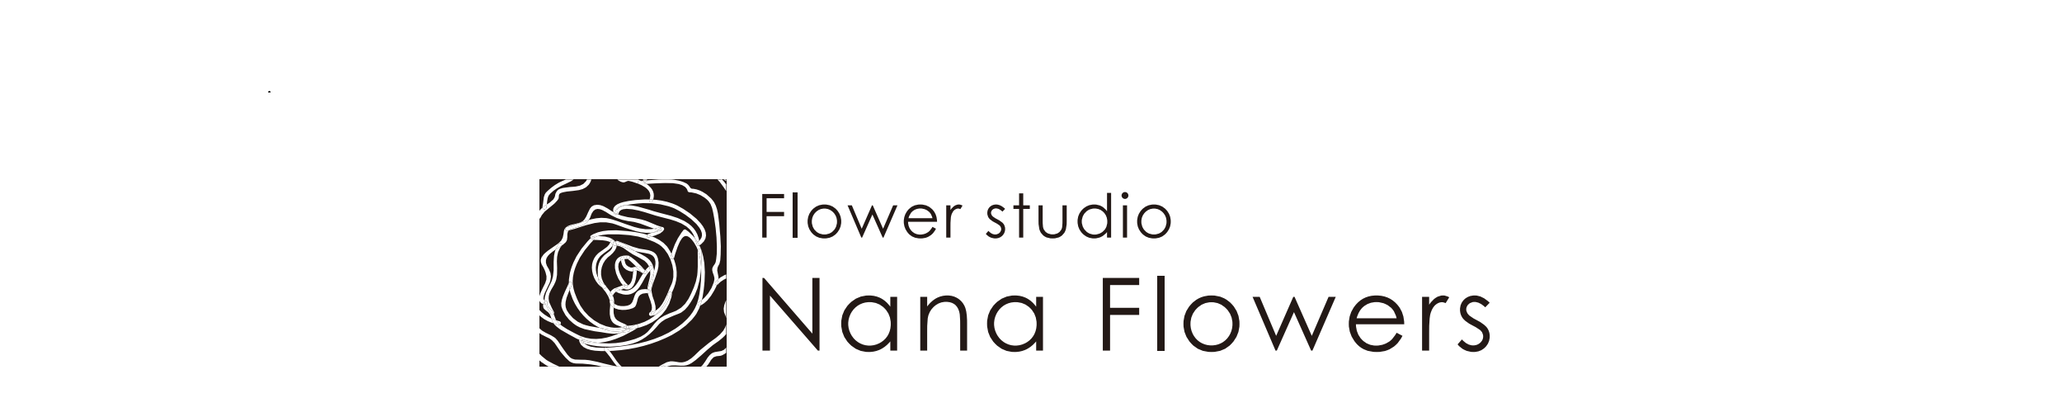 nanaflowers